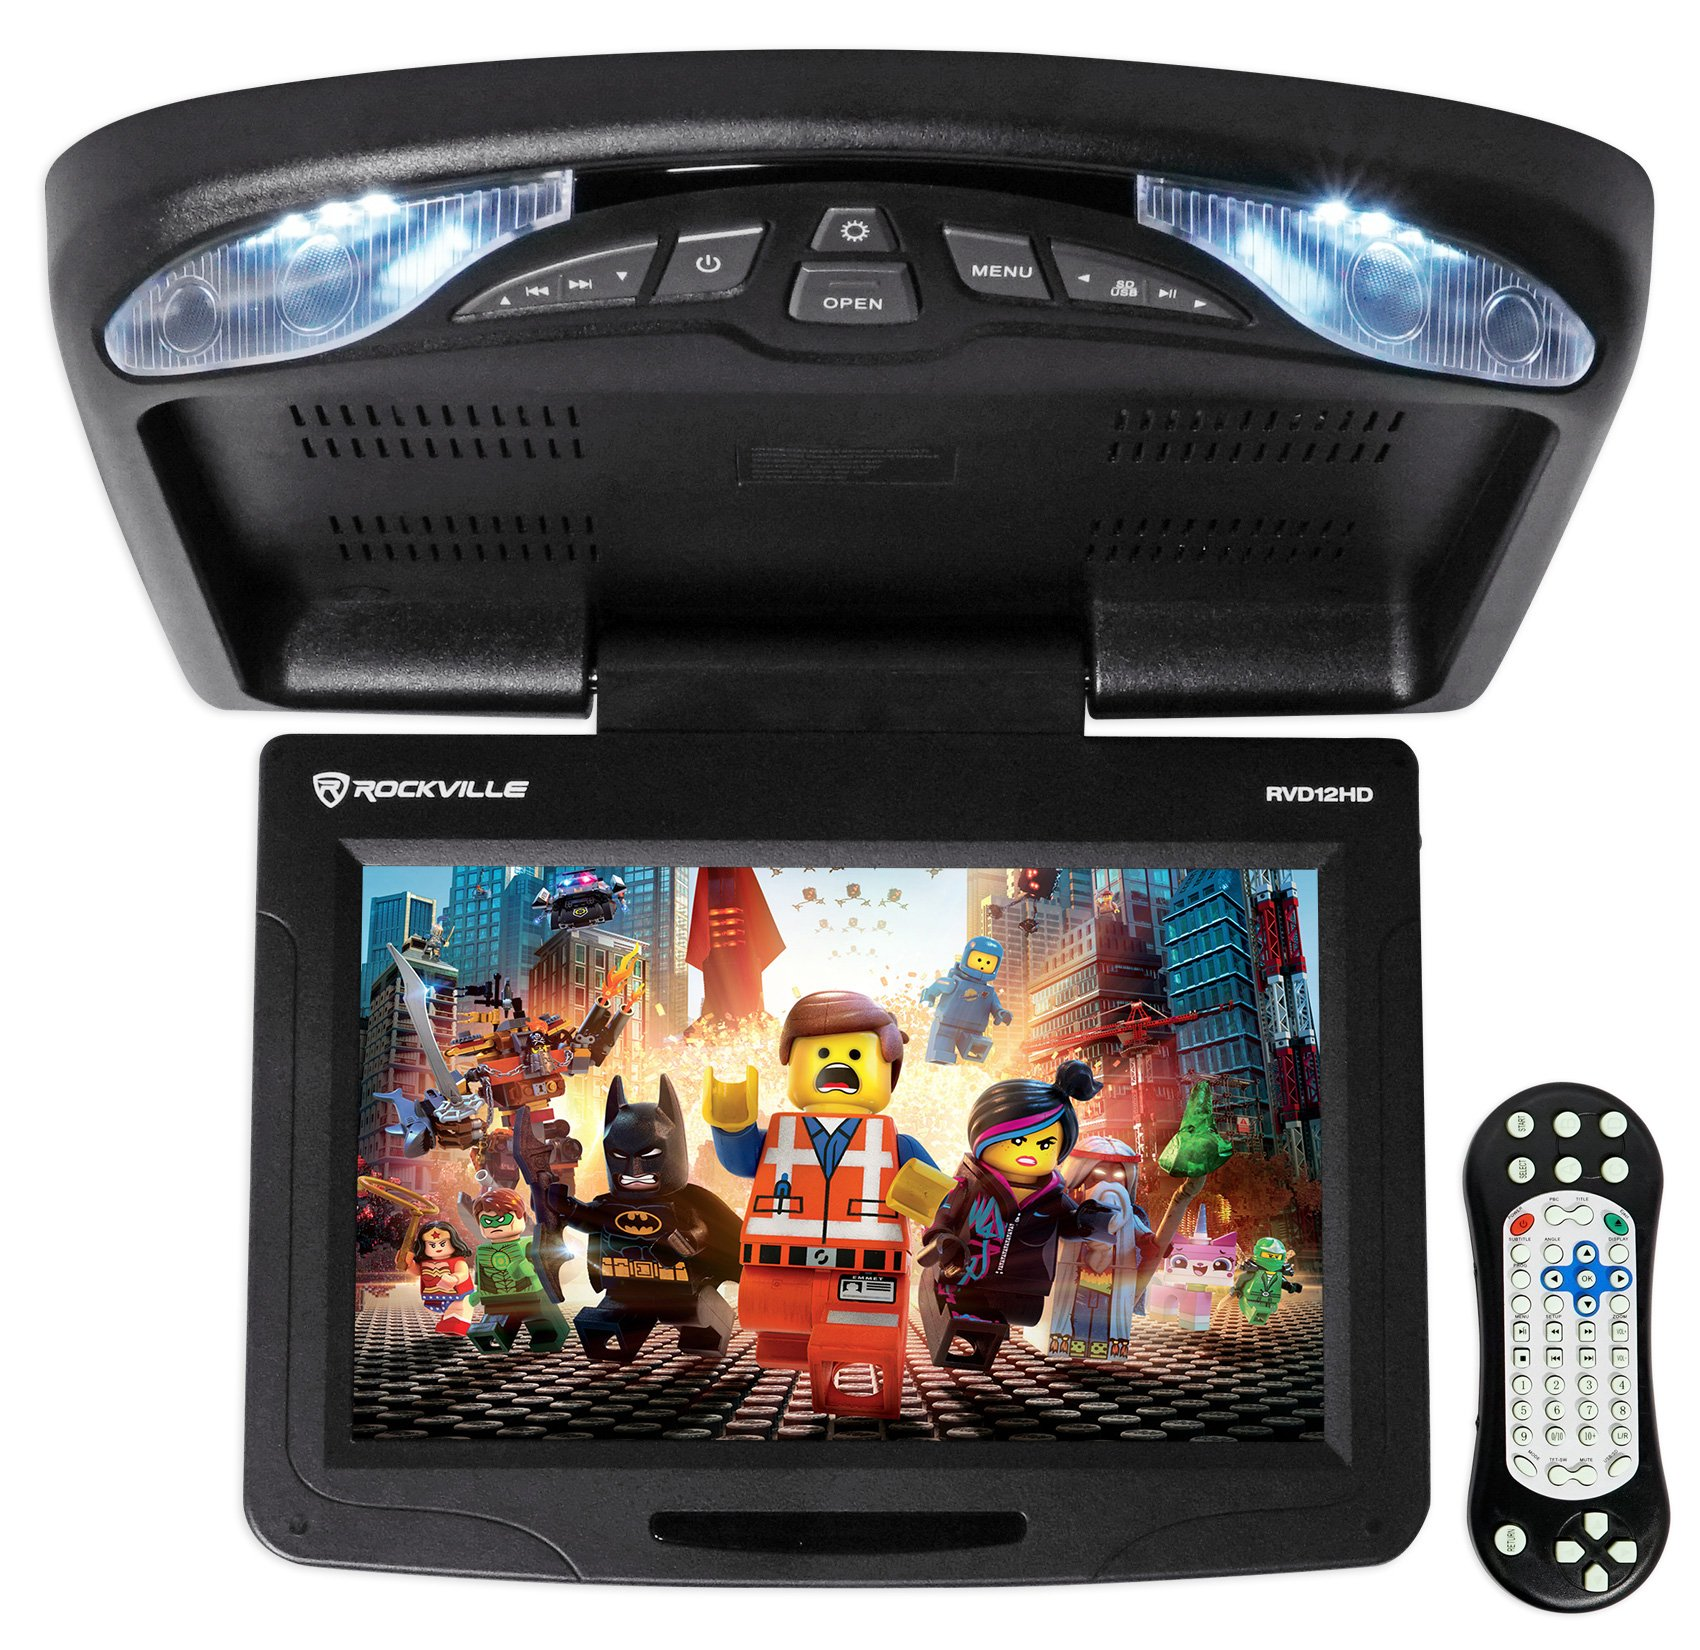 Rockville RVD12HD-BK 12'' Black Flip Down Car Monitor DVD/USB/SD Player + Games by Rockville